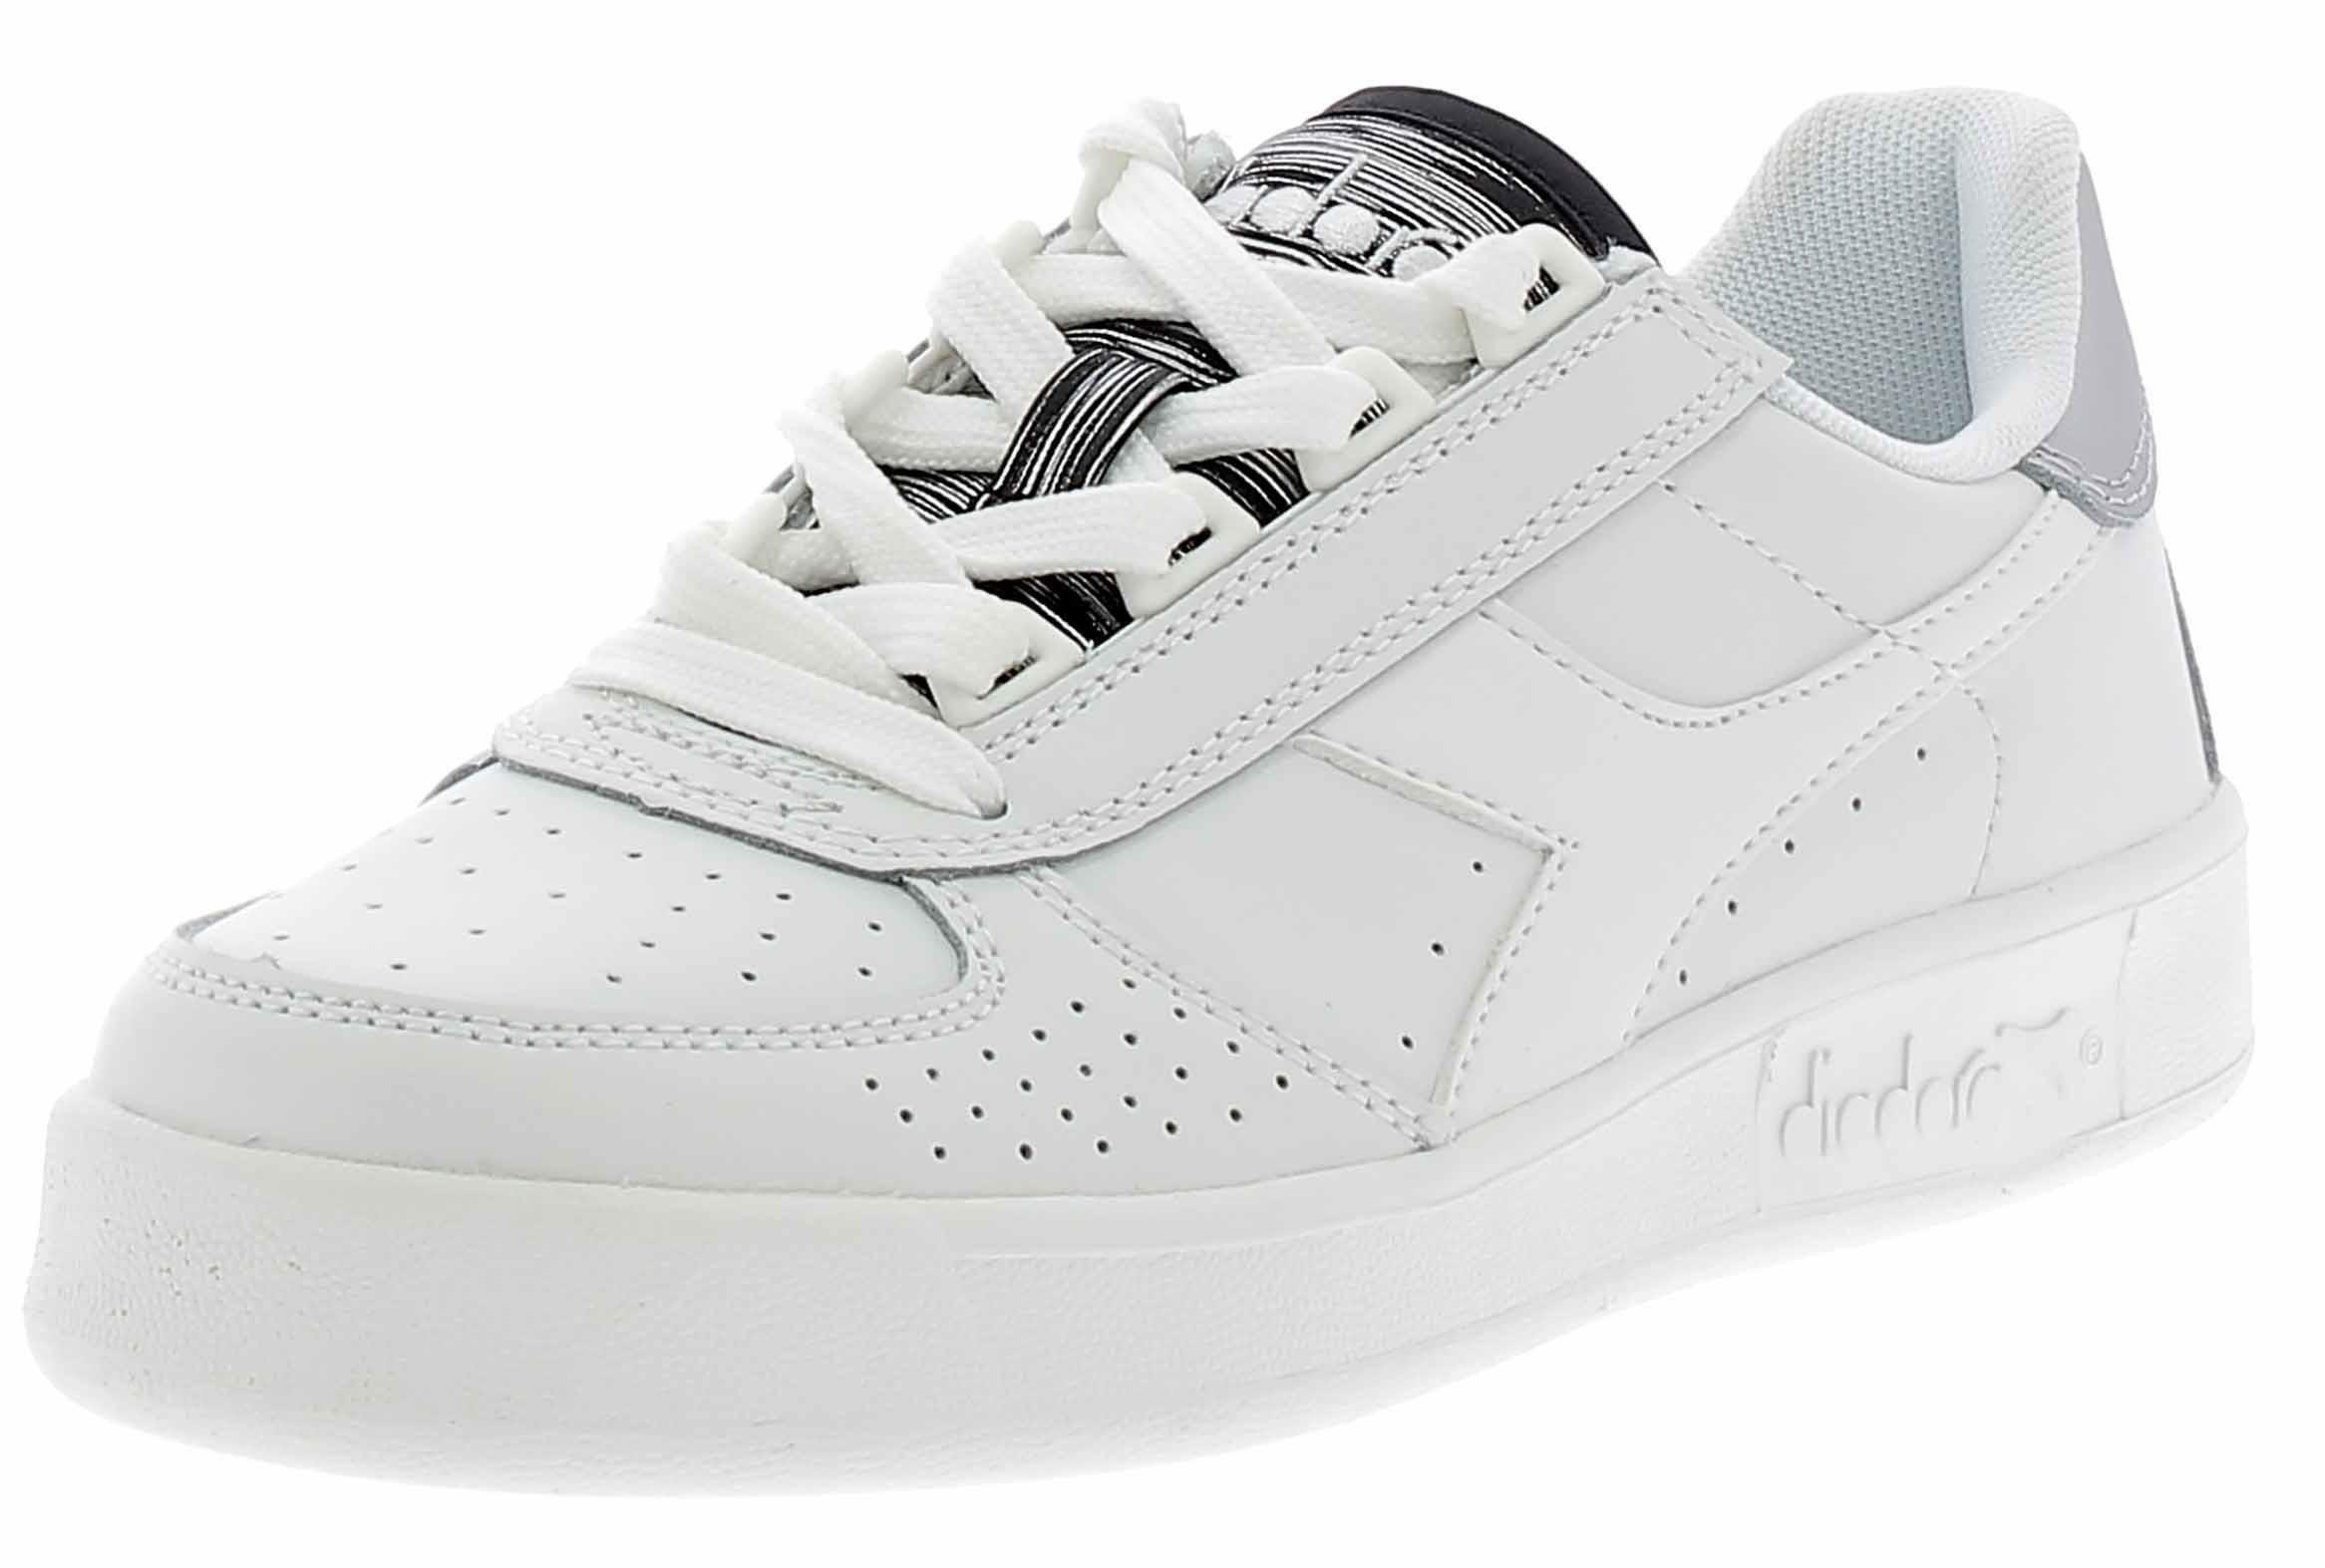 size 40 c9a07 8756b Diadora elite scarpe sportive donna bianche 17399301c0516